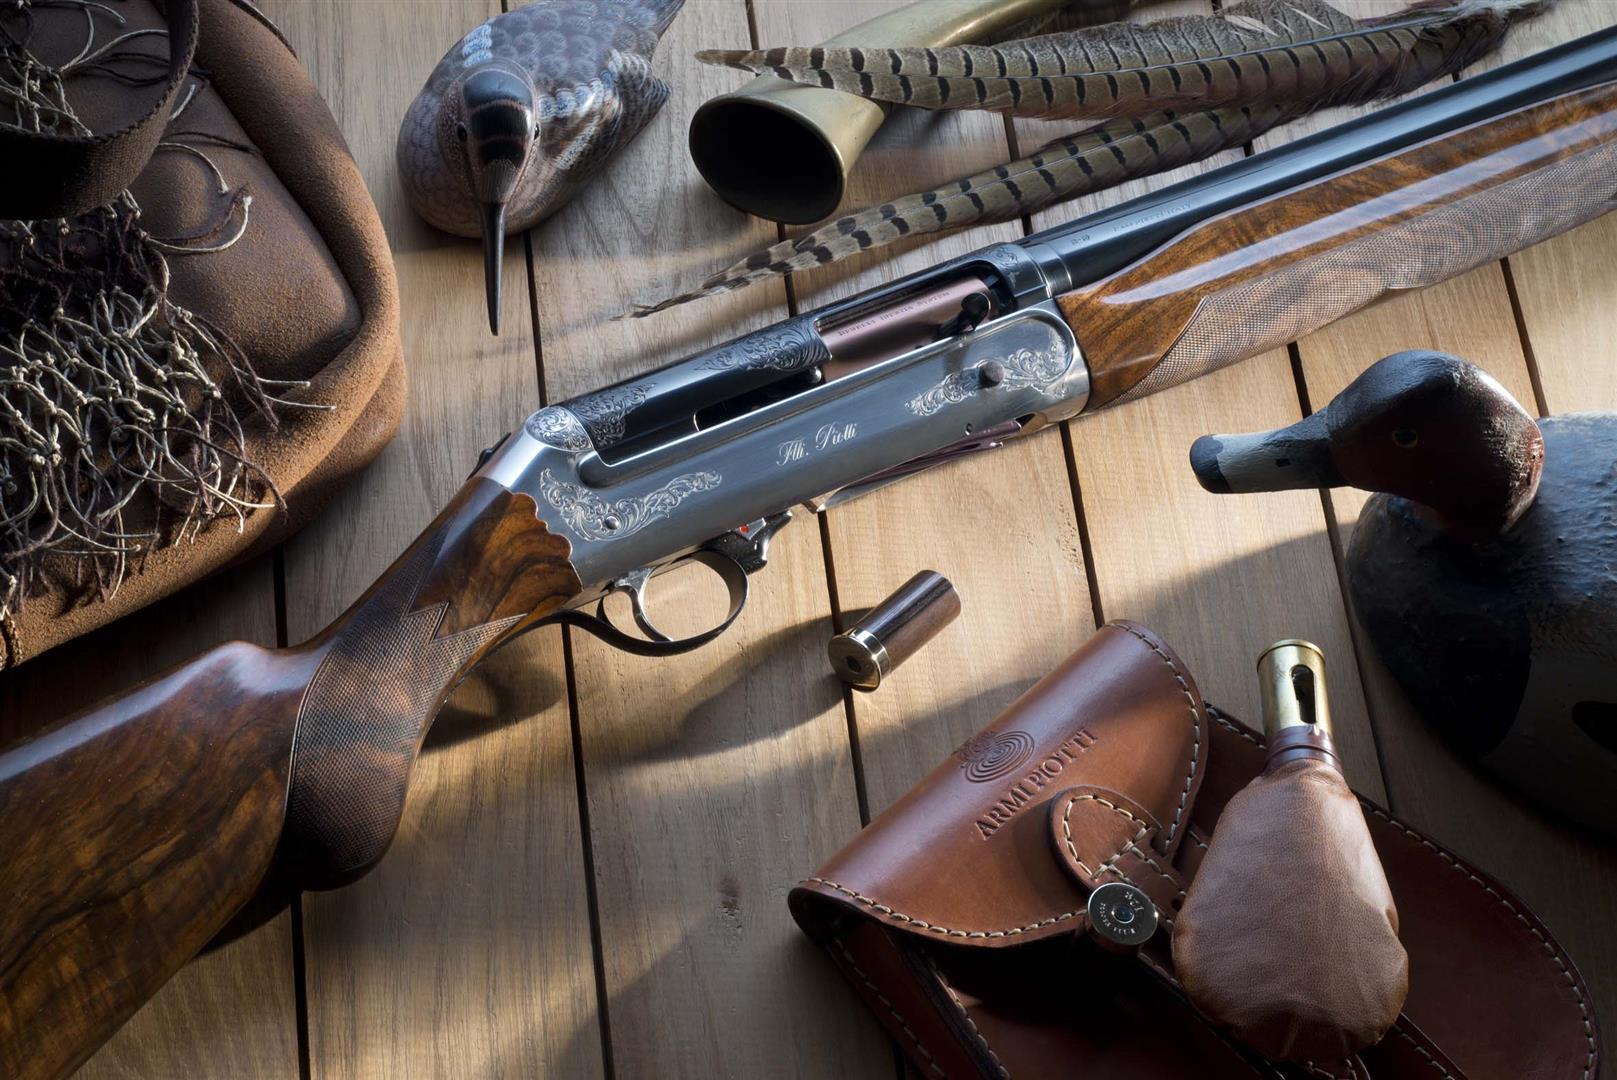 Piotti Benelli shotgun